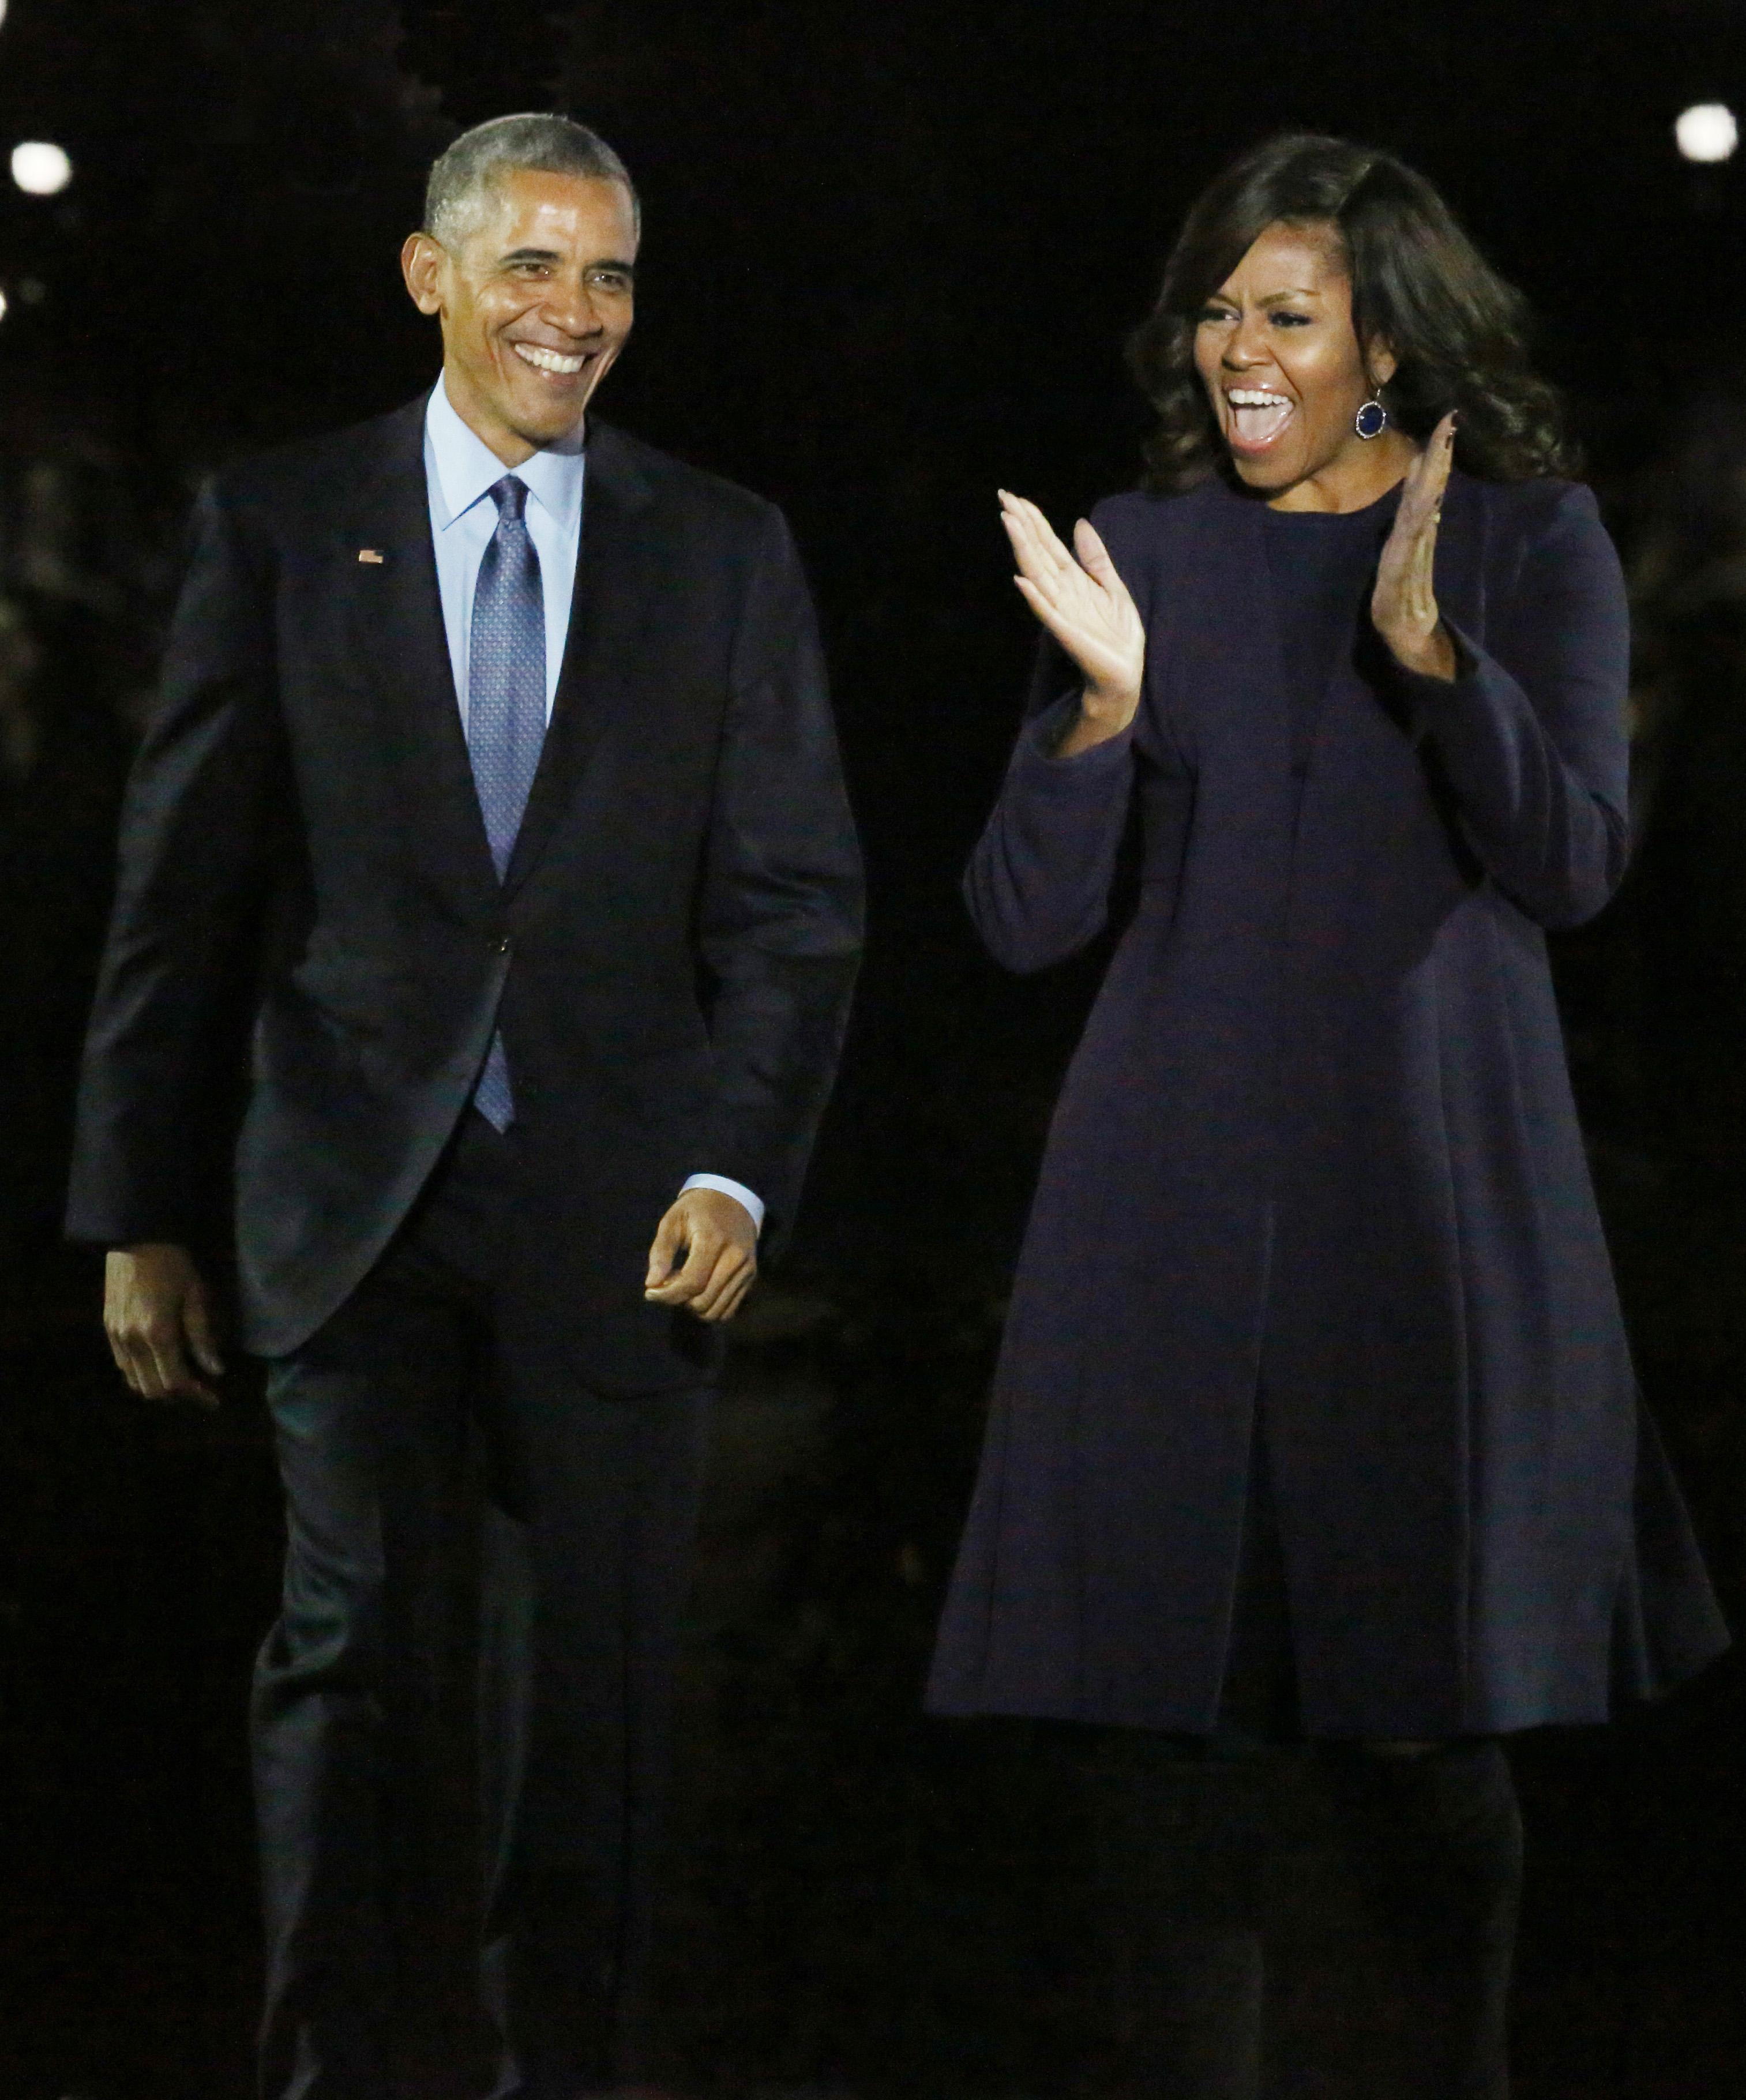 Obamas Headline YouTube Virtual Graduation 2020